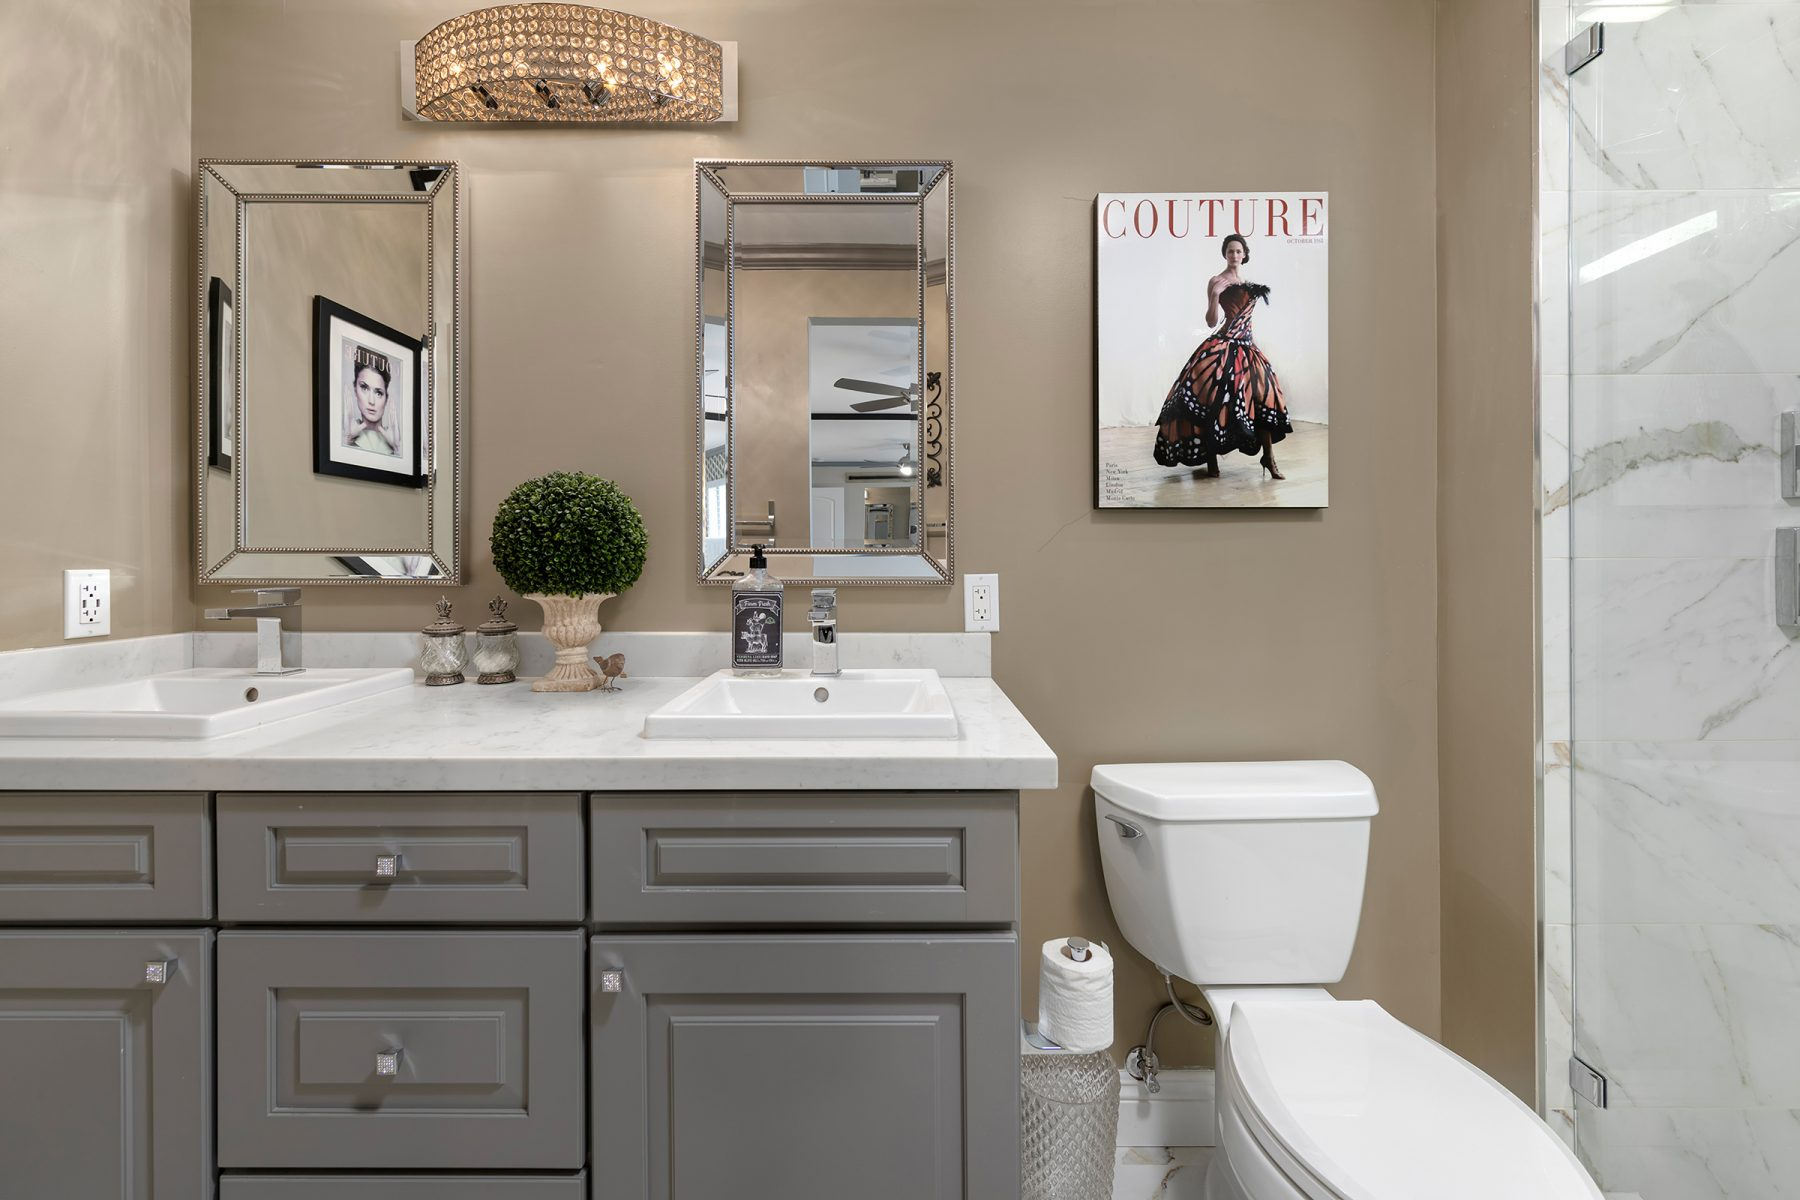 CliqStudios bath cabinets shown in Cambridge Studio Gray door style and finish